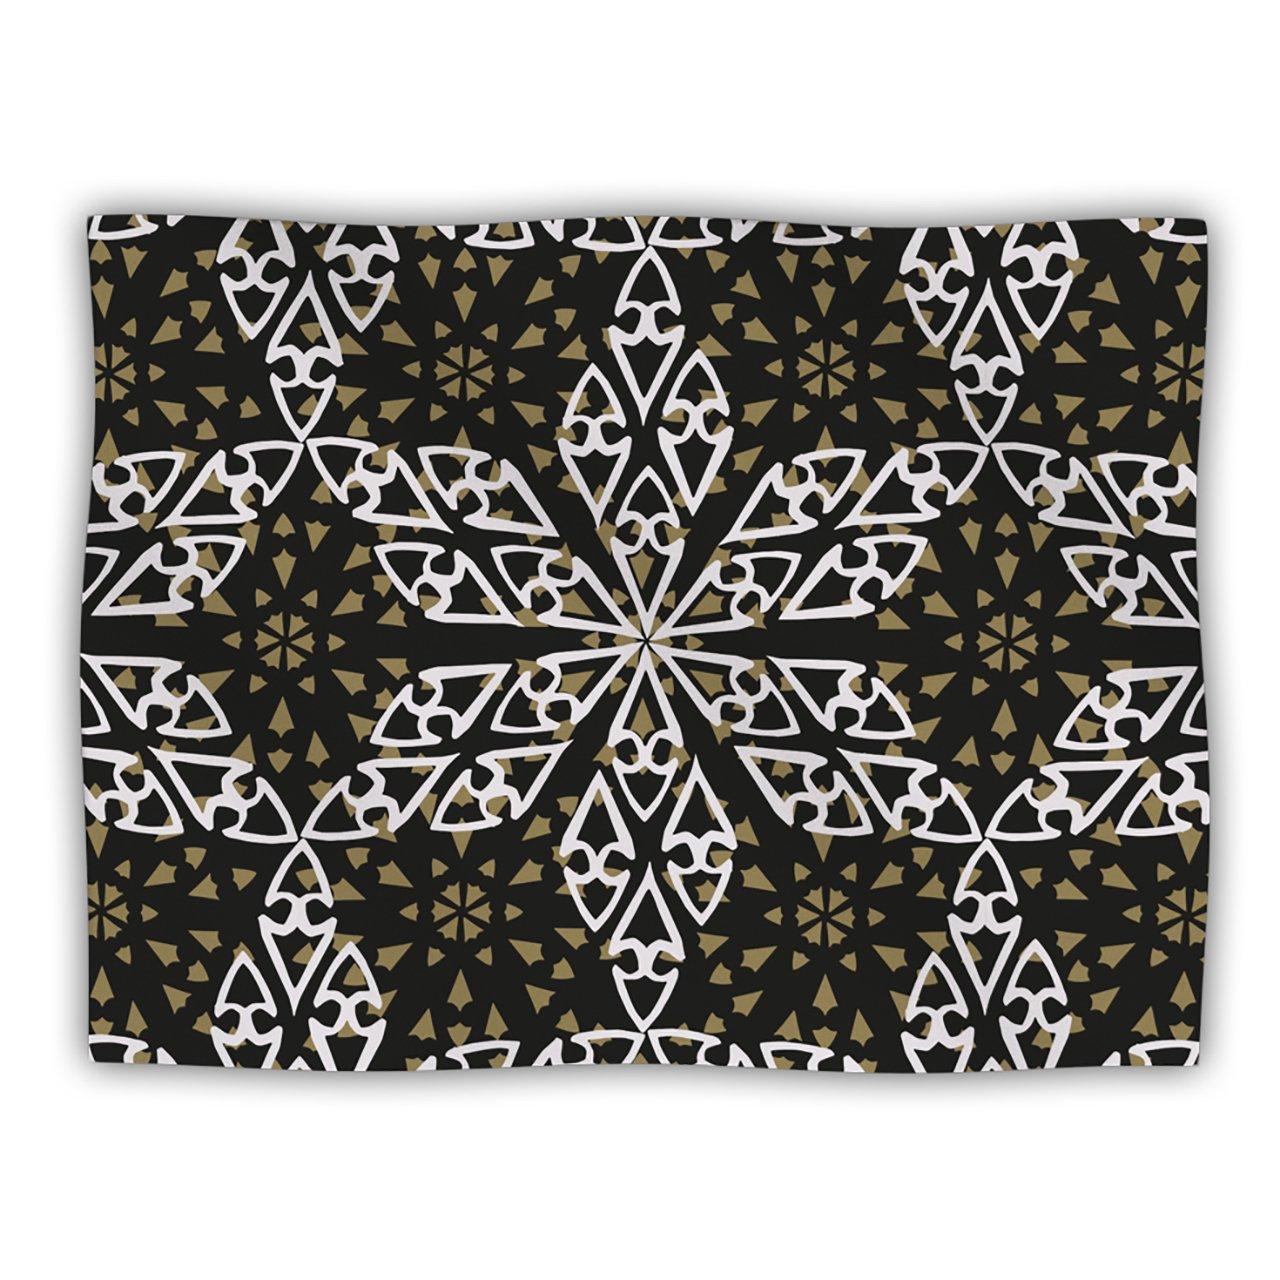 Kess InHouse Miranda Mol 'Ethnical Snowflakes' Dog Blanket, 40 by 30-Inch